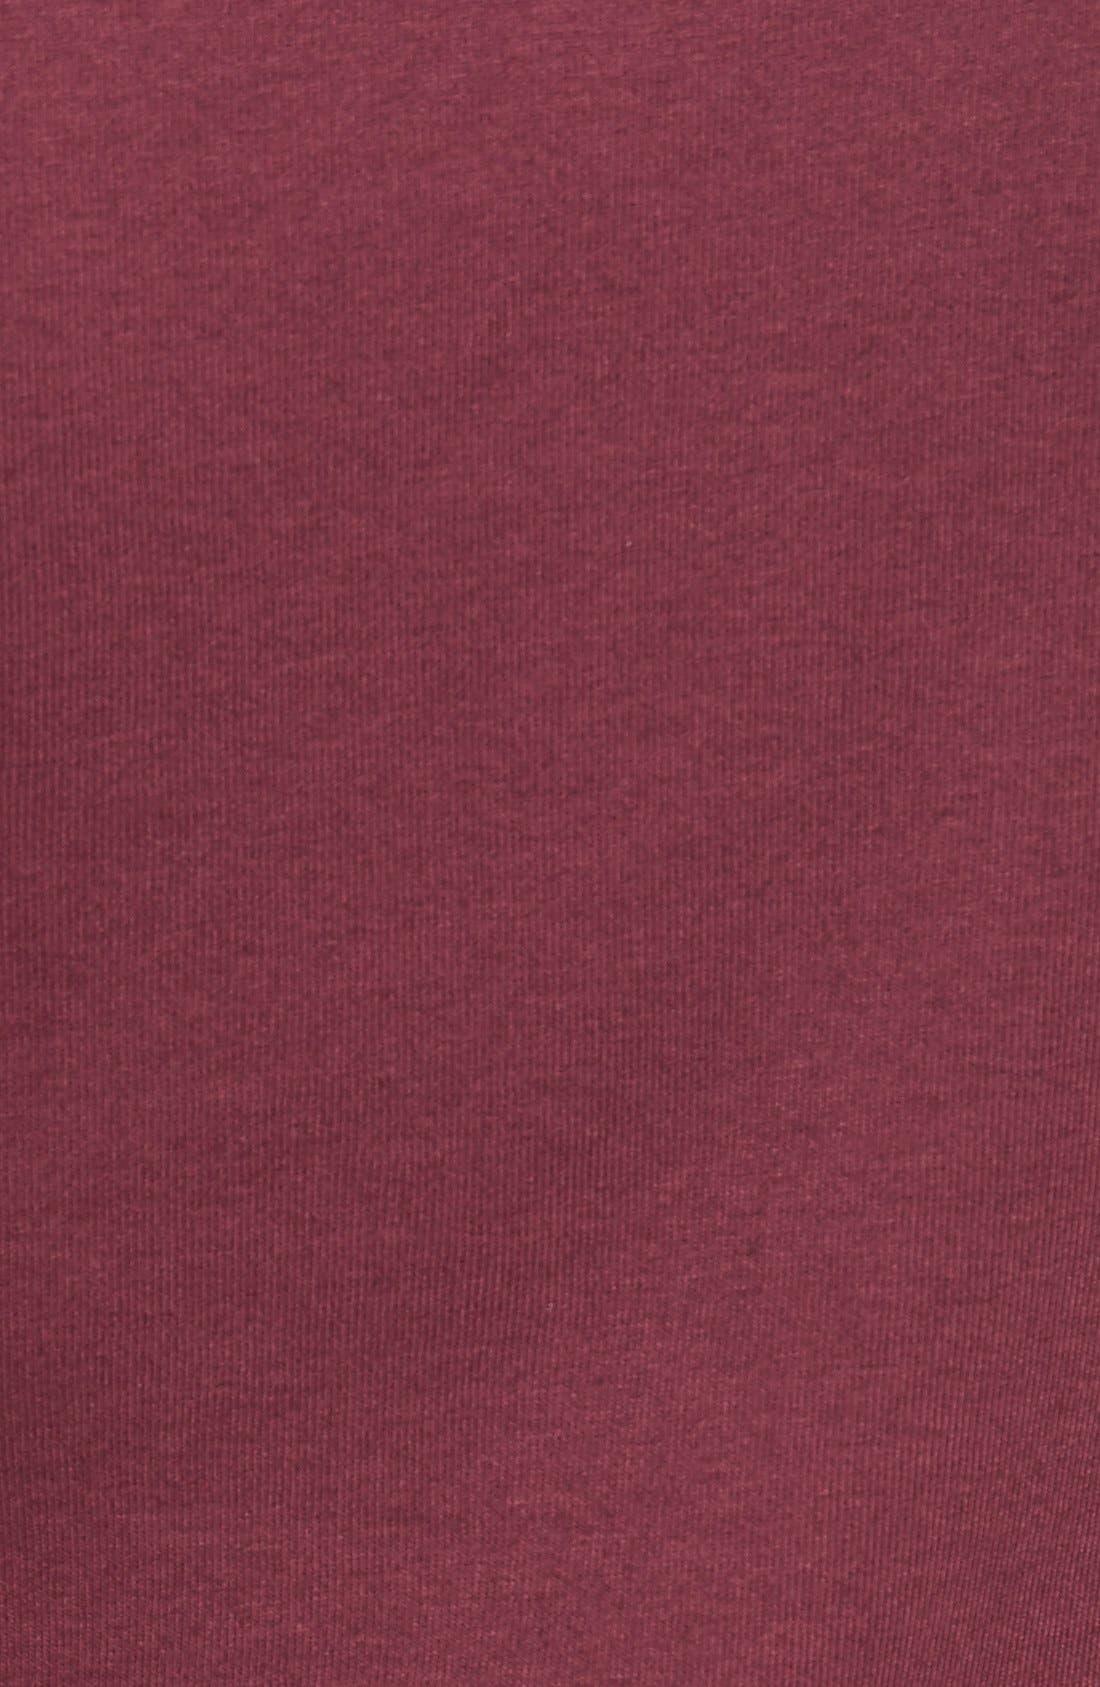 Ballet Neck Cotton & Modal Knit Elbow Sleeve Tee,                             Alternate thumbnail 265, color,